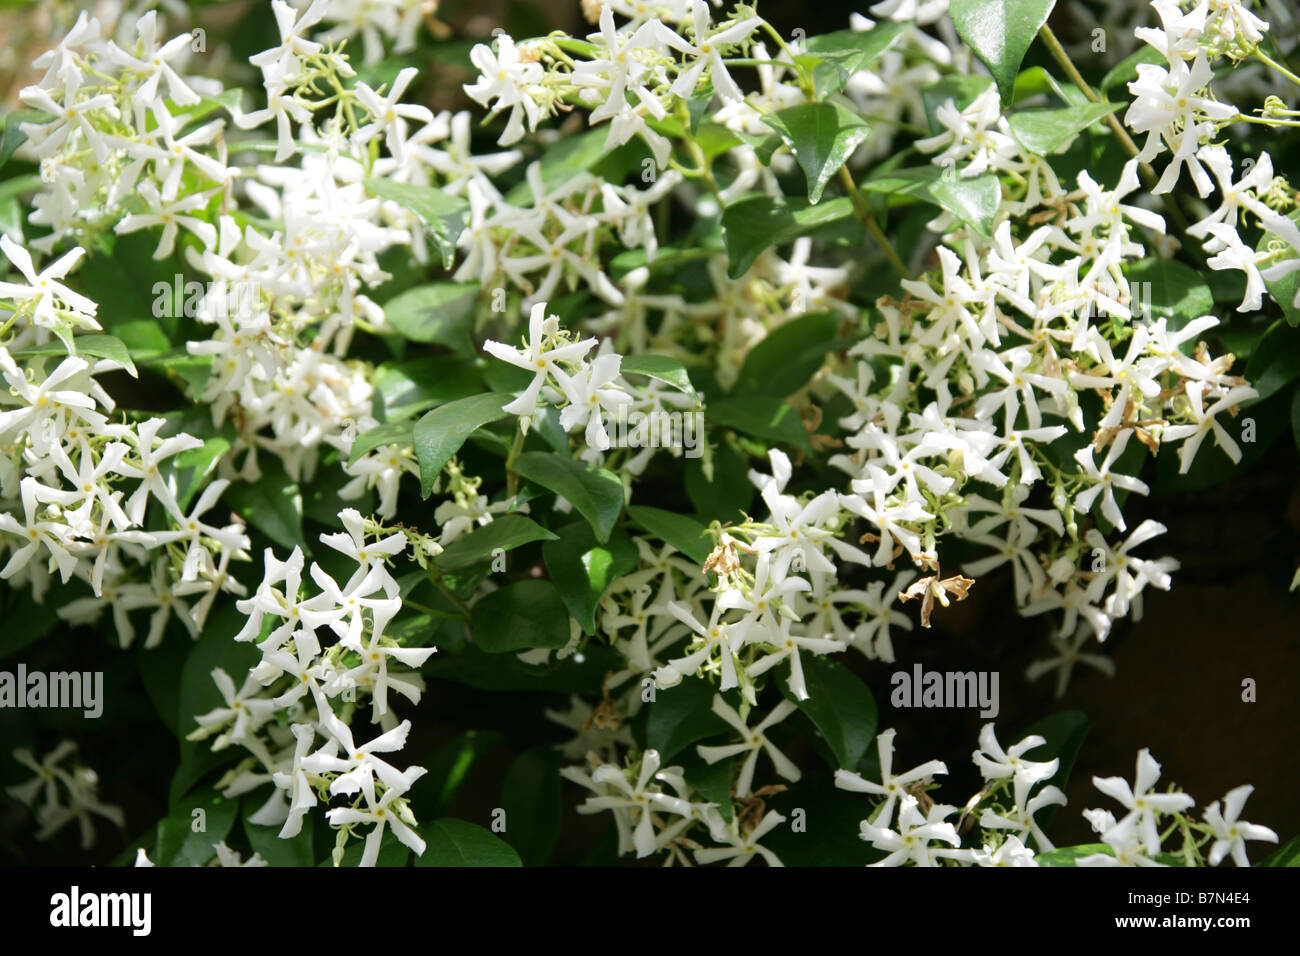 Star Jasmine or Confederate Jasmine, Trachelospermum jasminoides syn Rhynchospermum jasminoides, Apocynaceae - Stock Image